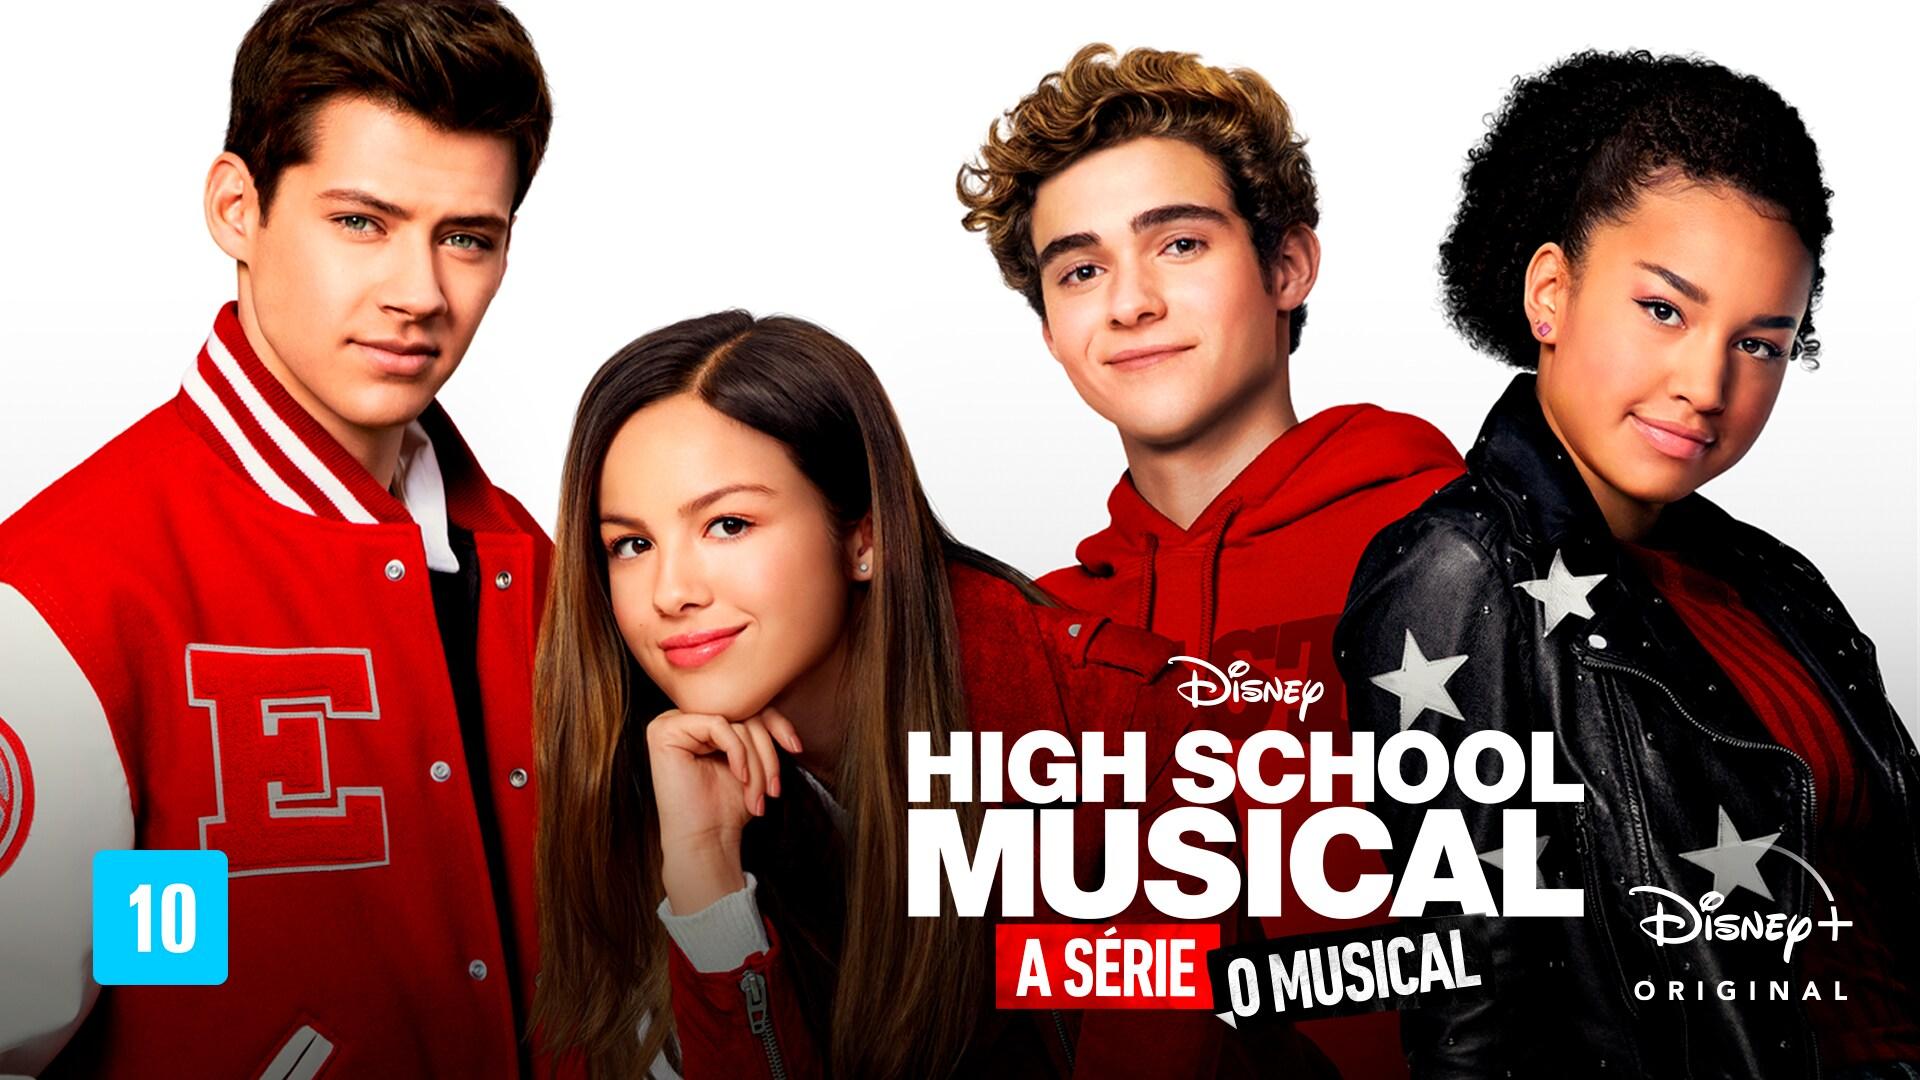 High School Musical: A Série: O Musical   Disponível no Disney+ a partir de 17 de novembro